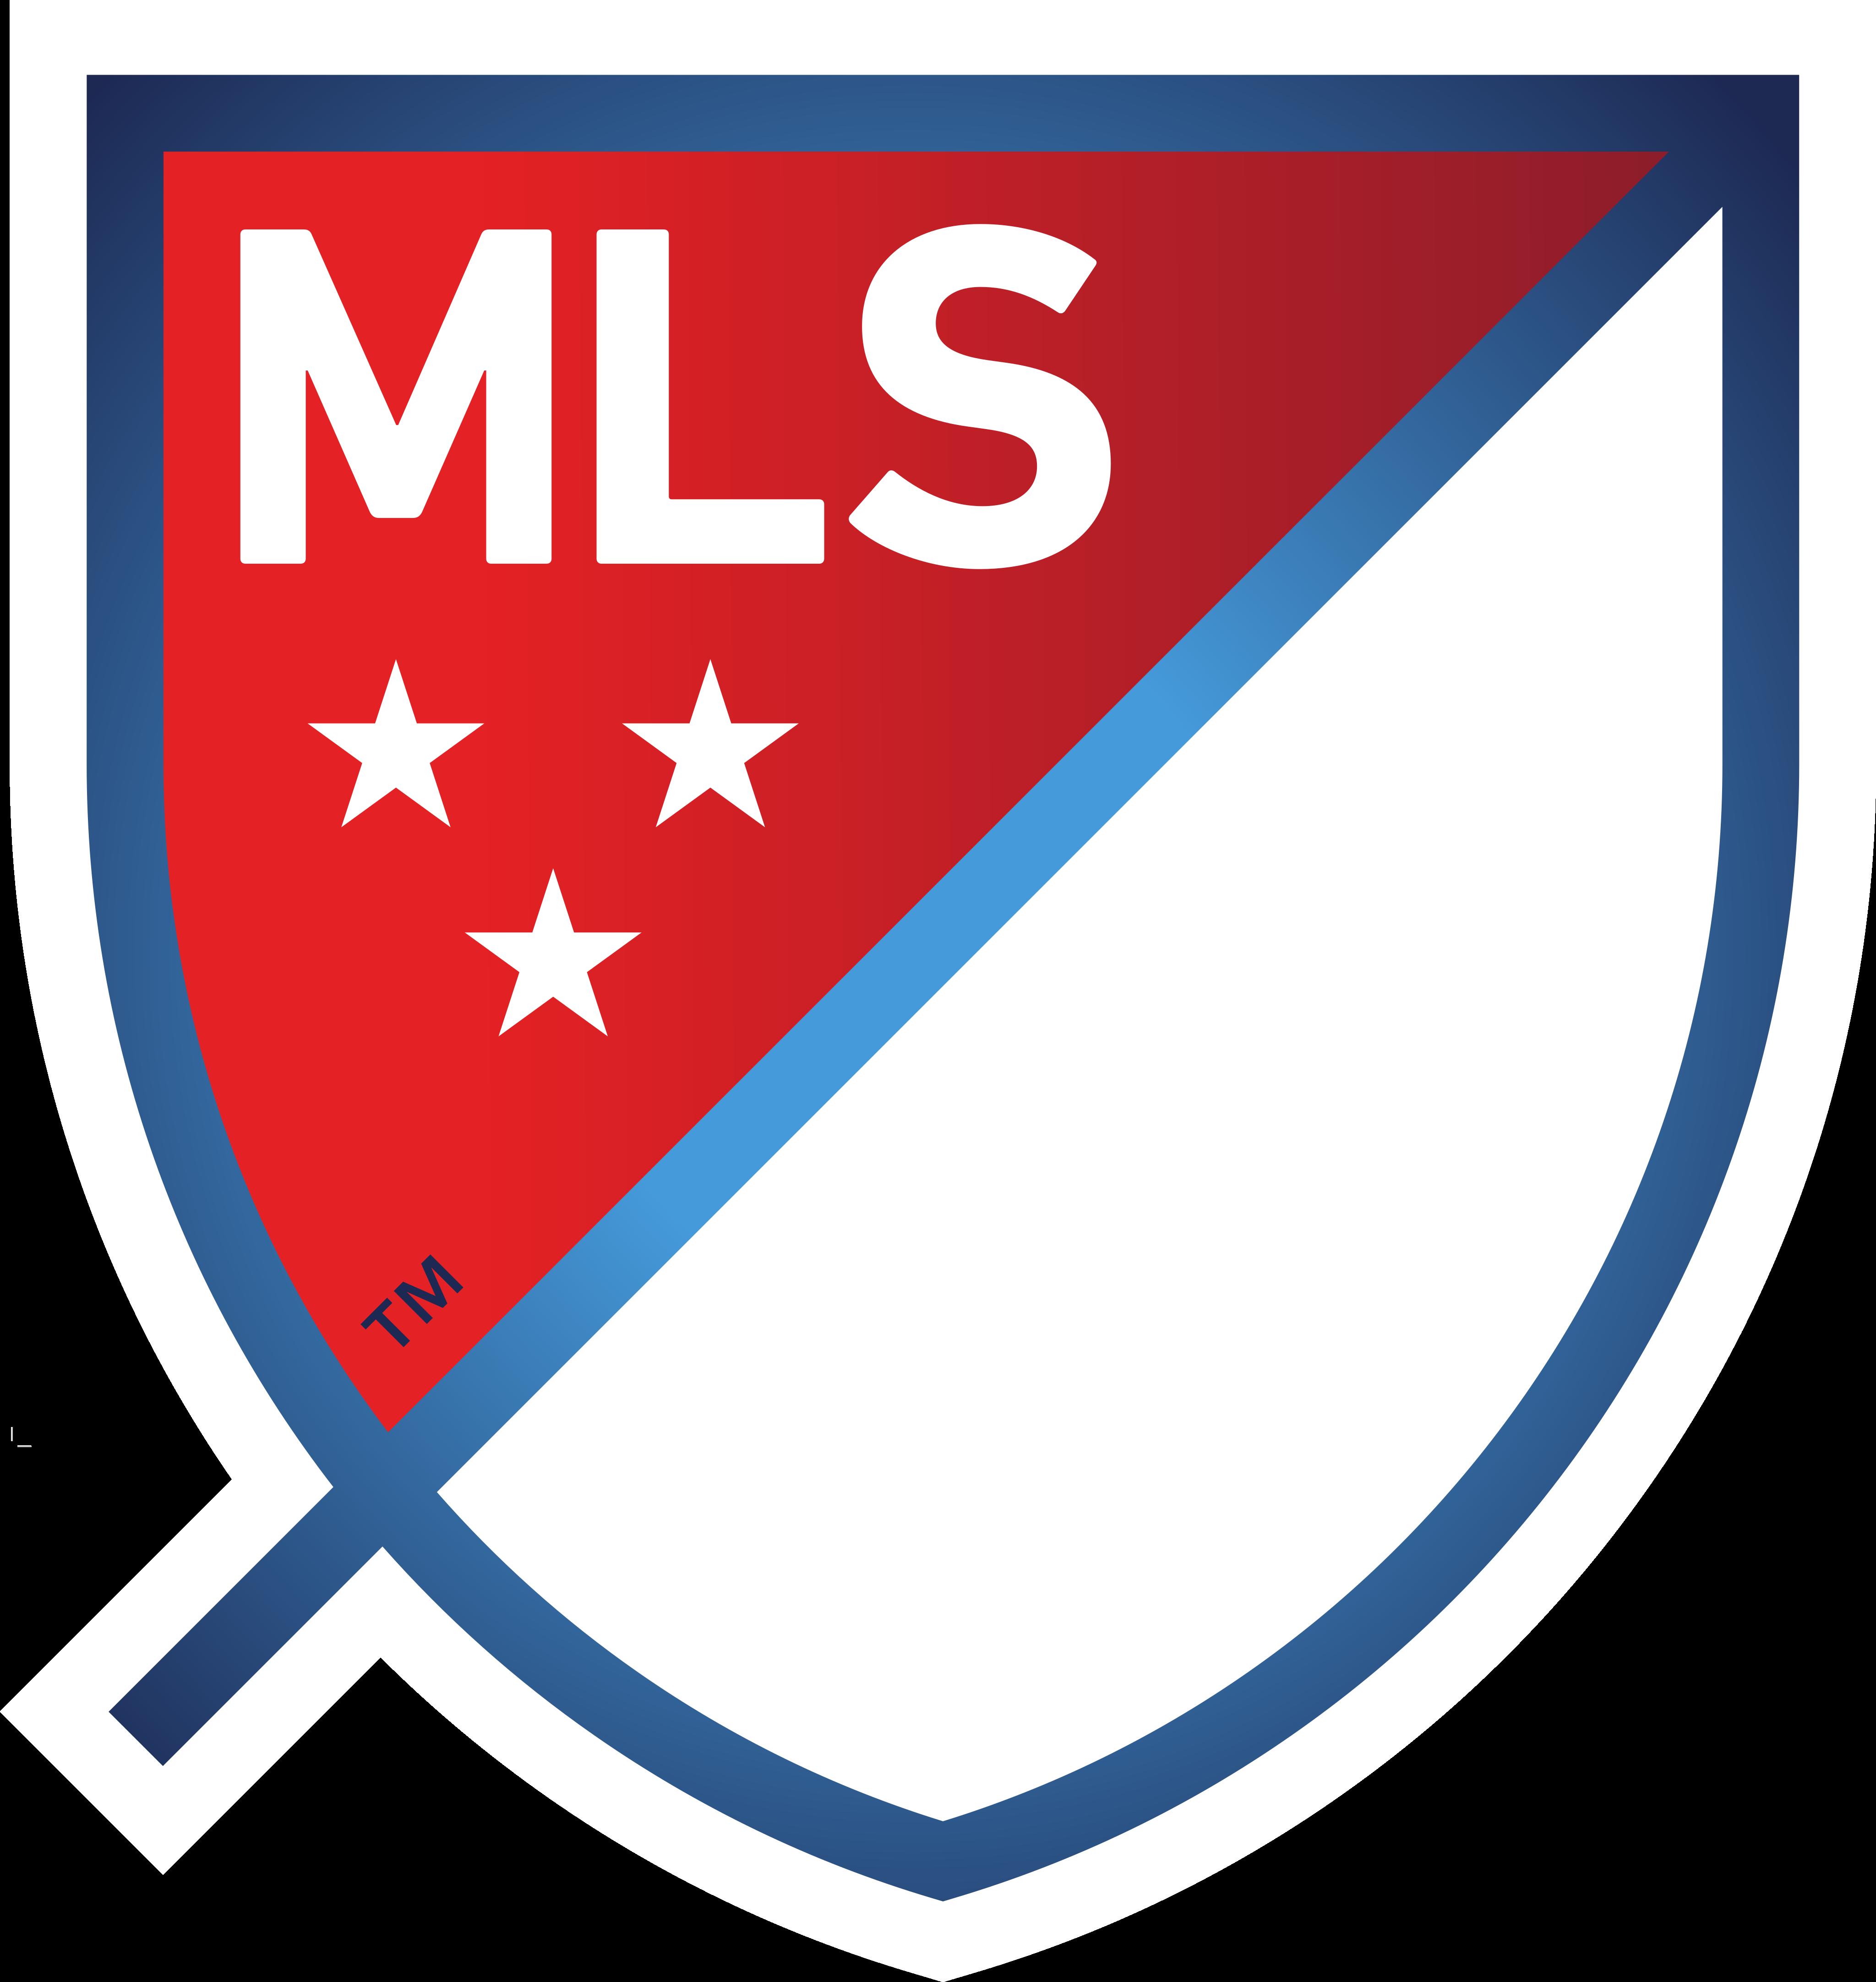 mls logo - MLS Logo - Major League Soccer Logo